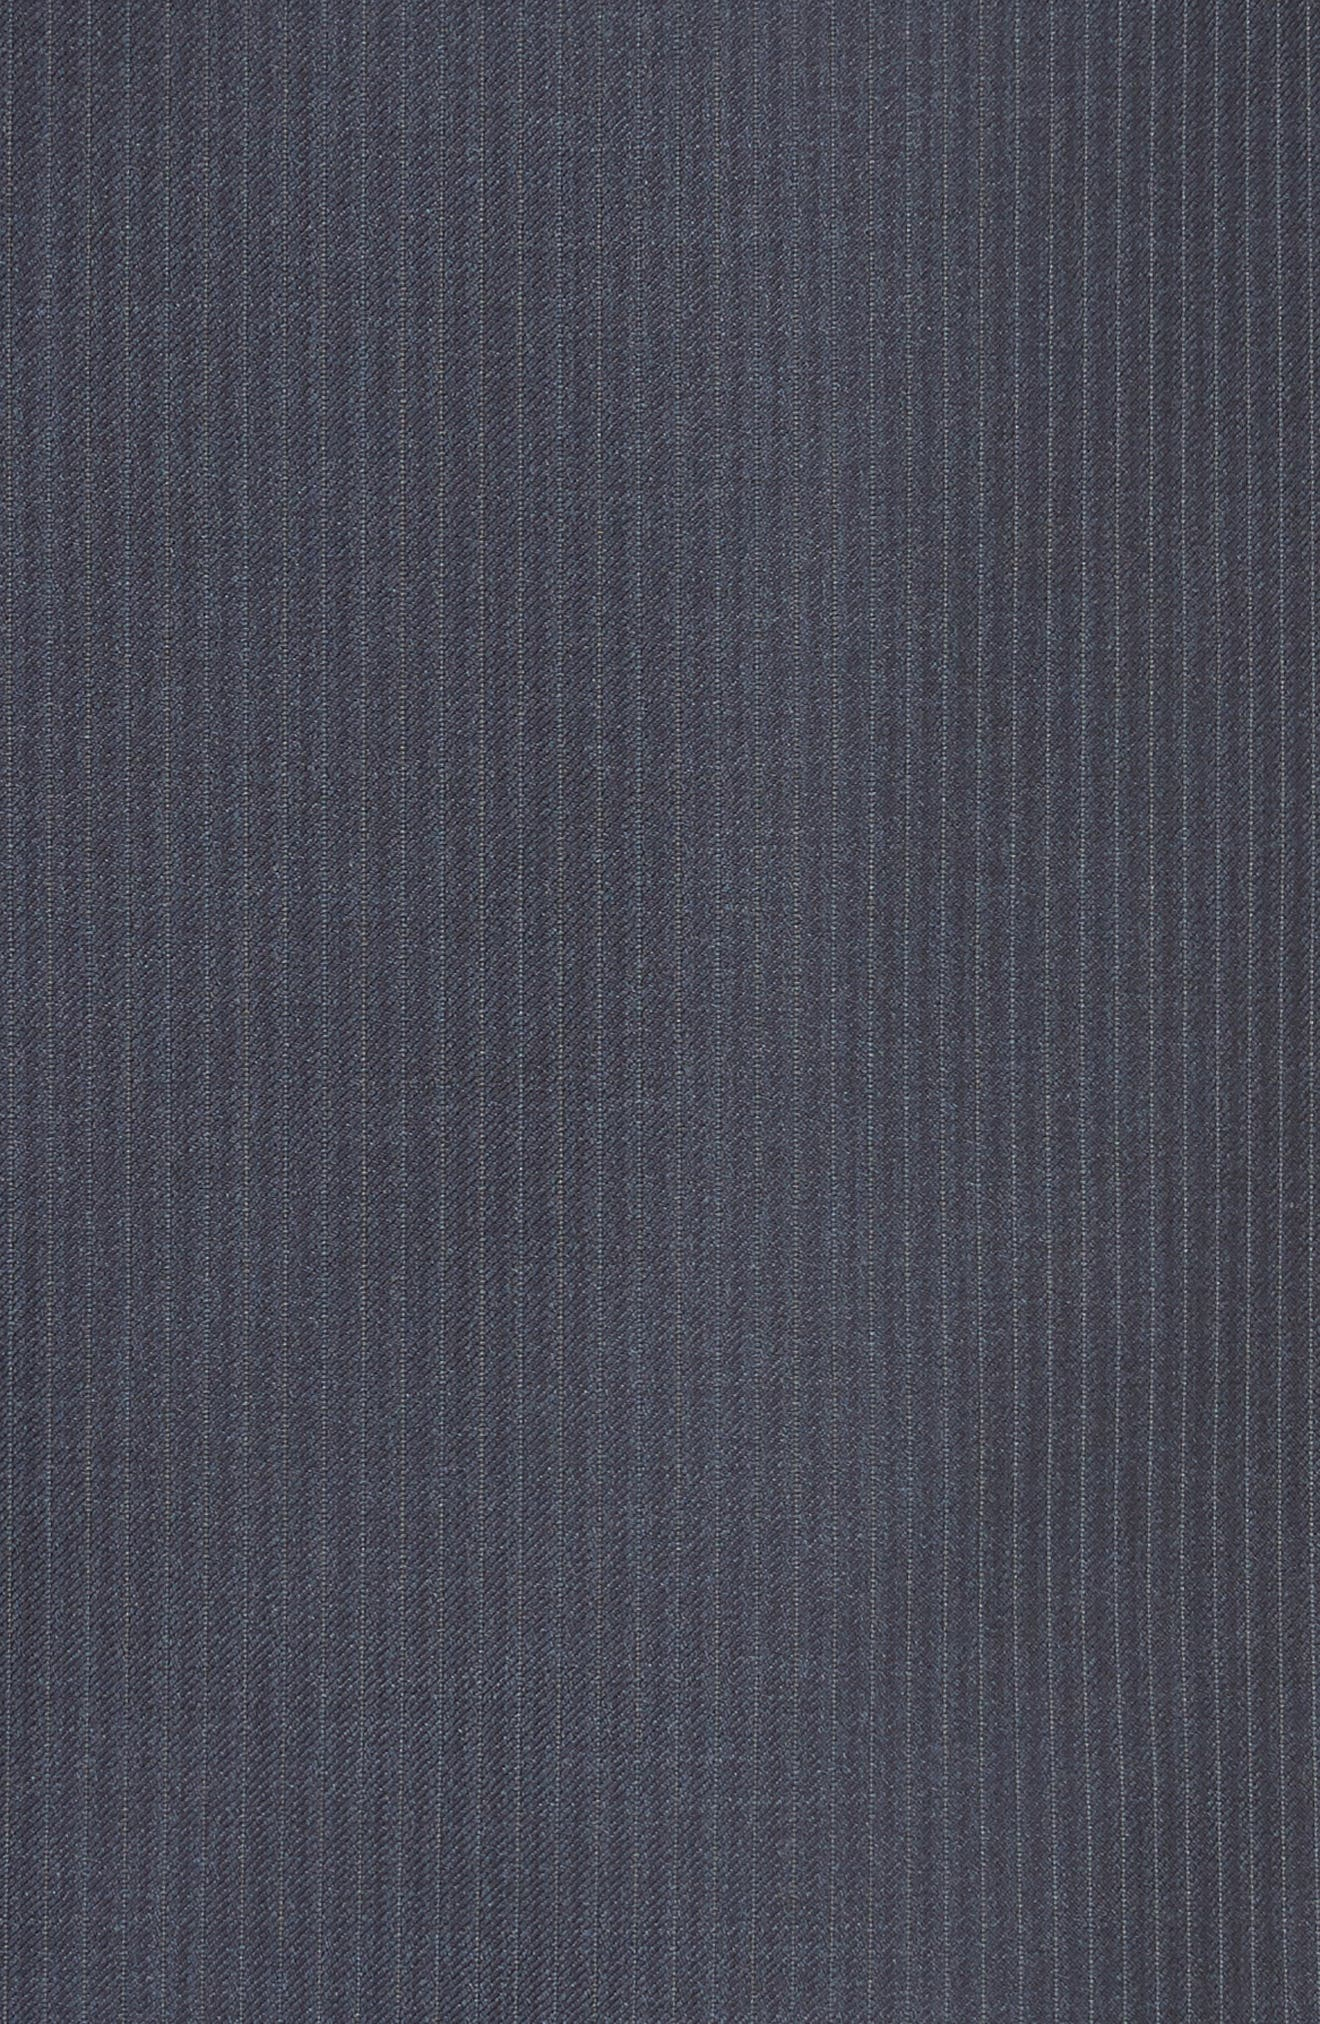 Classic Fit Pinstripe Wool Suit,                             Alternate thumbnail 7, color,                             410